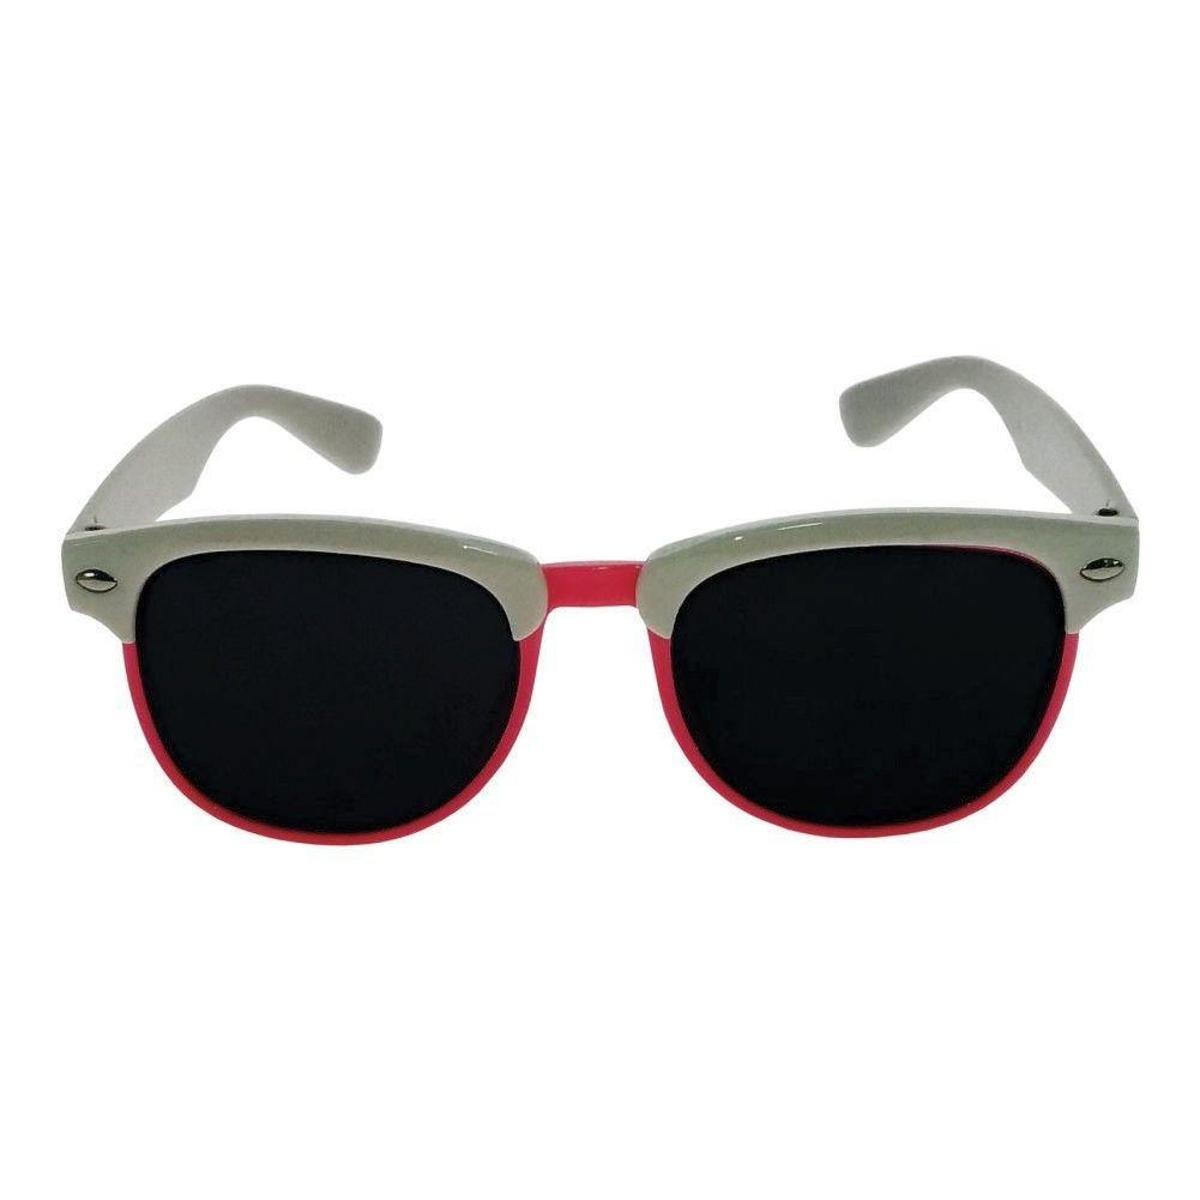 a6019ebac2999 Óculos de Sol Khatto Infantil Perussi Feminino - Branco e Rosa - Compre  Agora